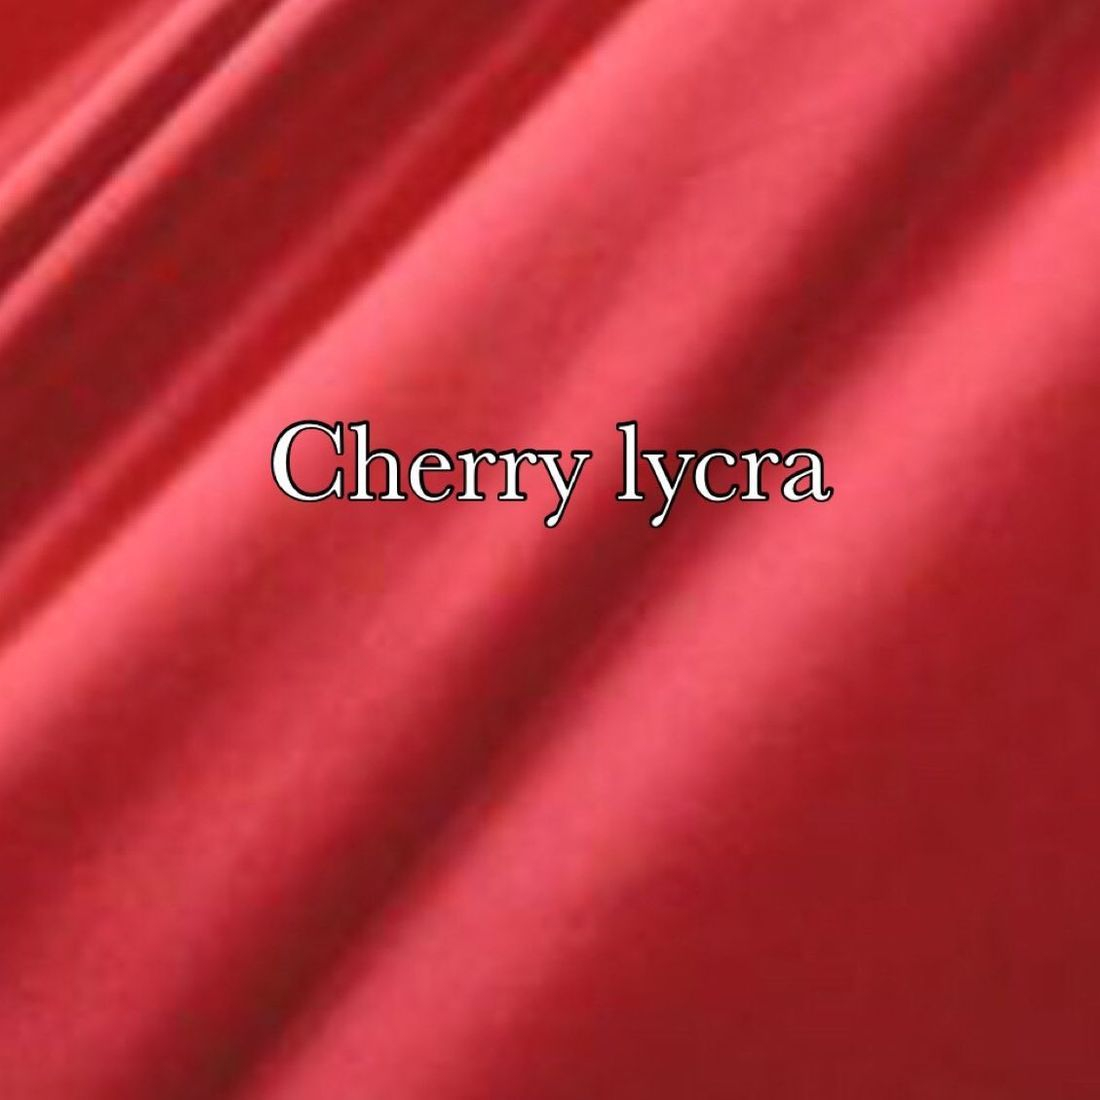 Cherry lycra